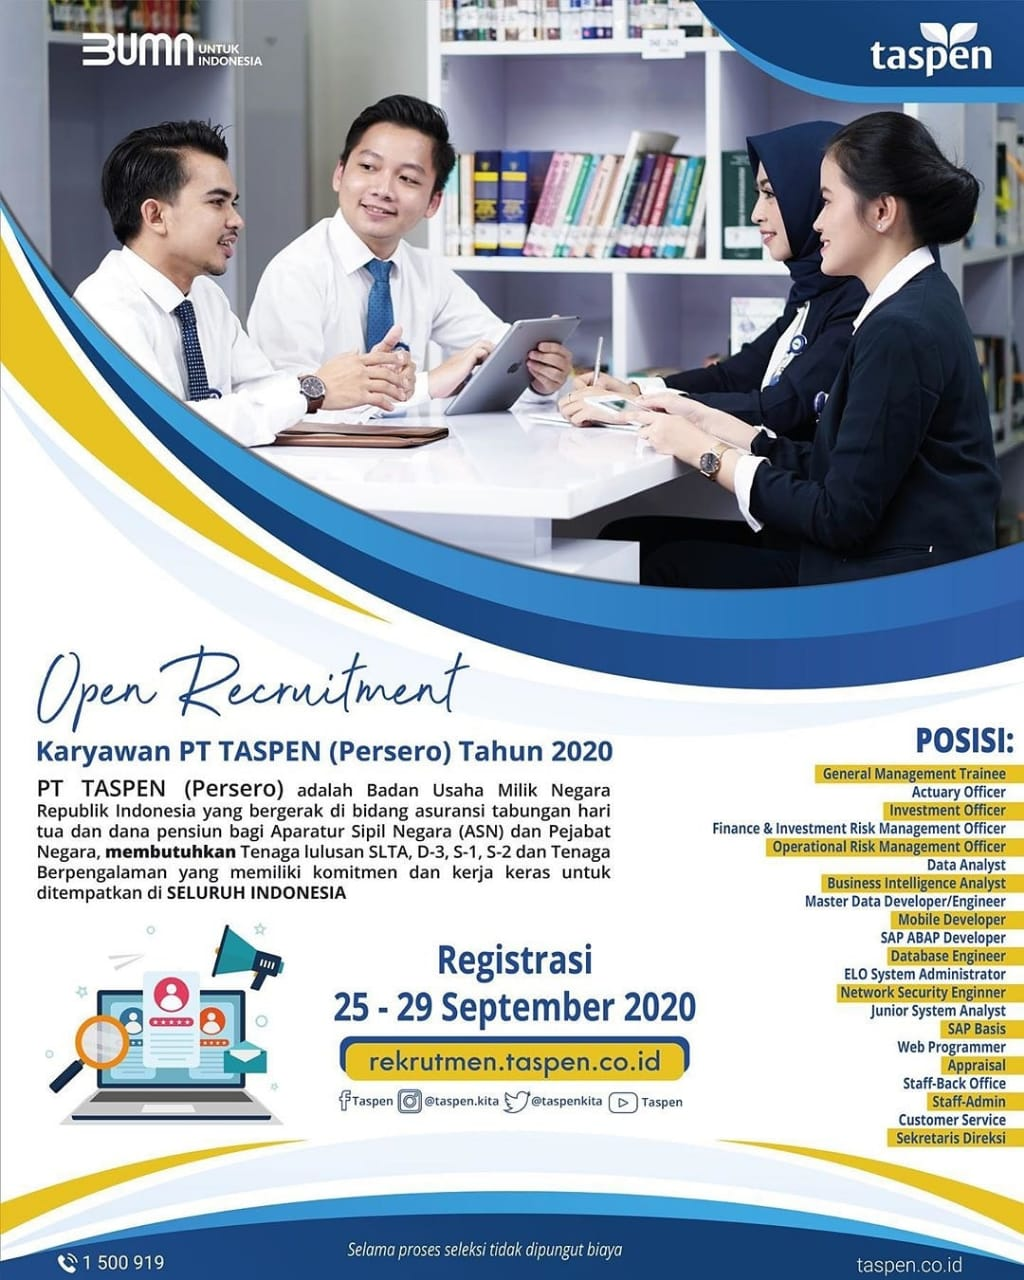 Lowongan Kerja Bumn Terbaru September 2020 Di Pt Taspen Medanloker Com Lowongan Kerja Medan